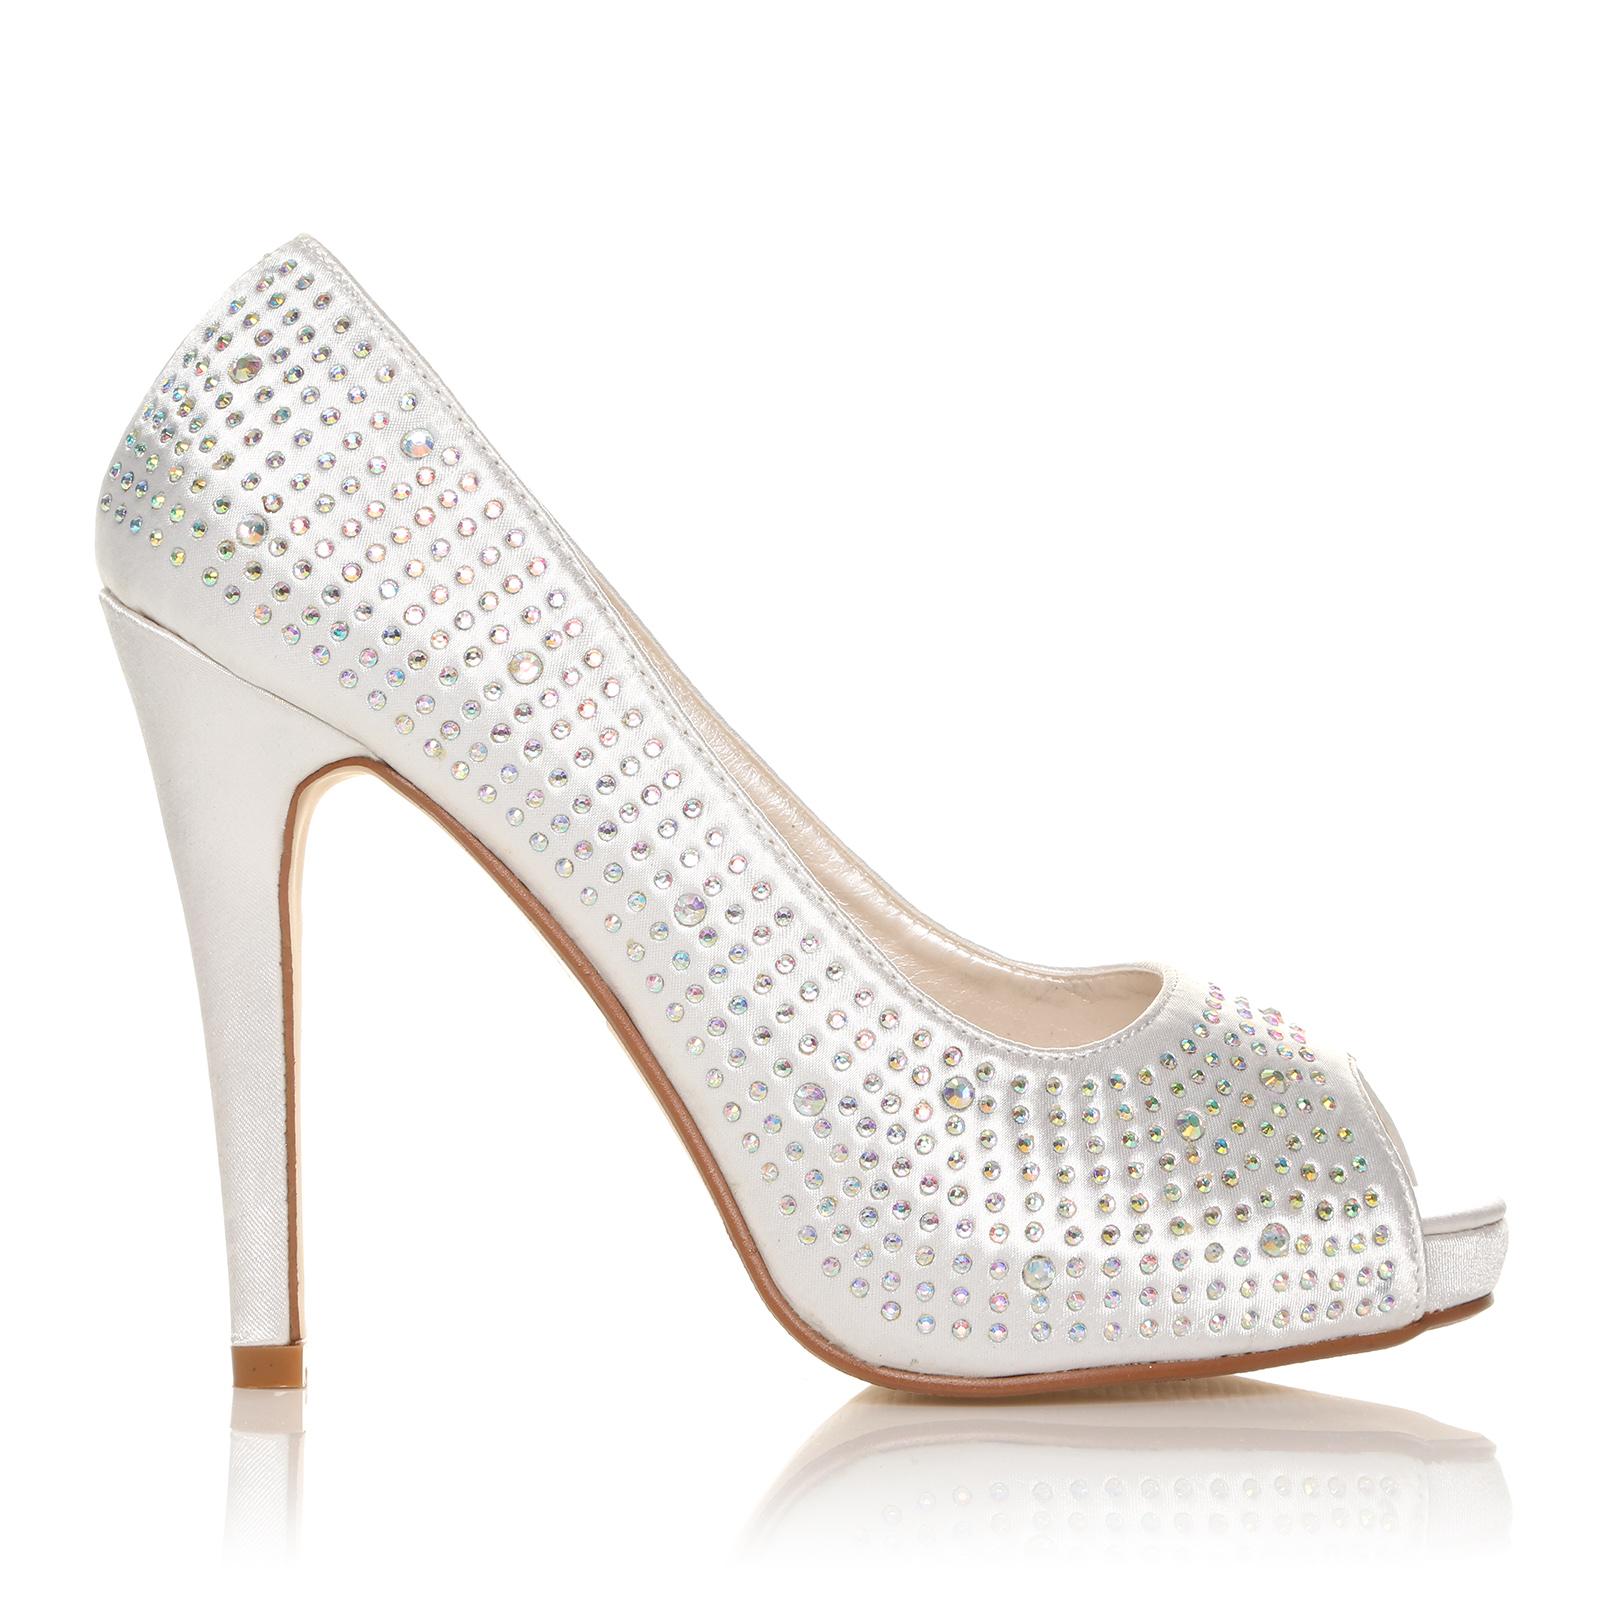 new wedding prom evening peep toe shoes diamante